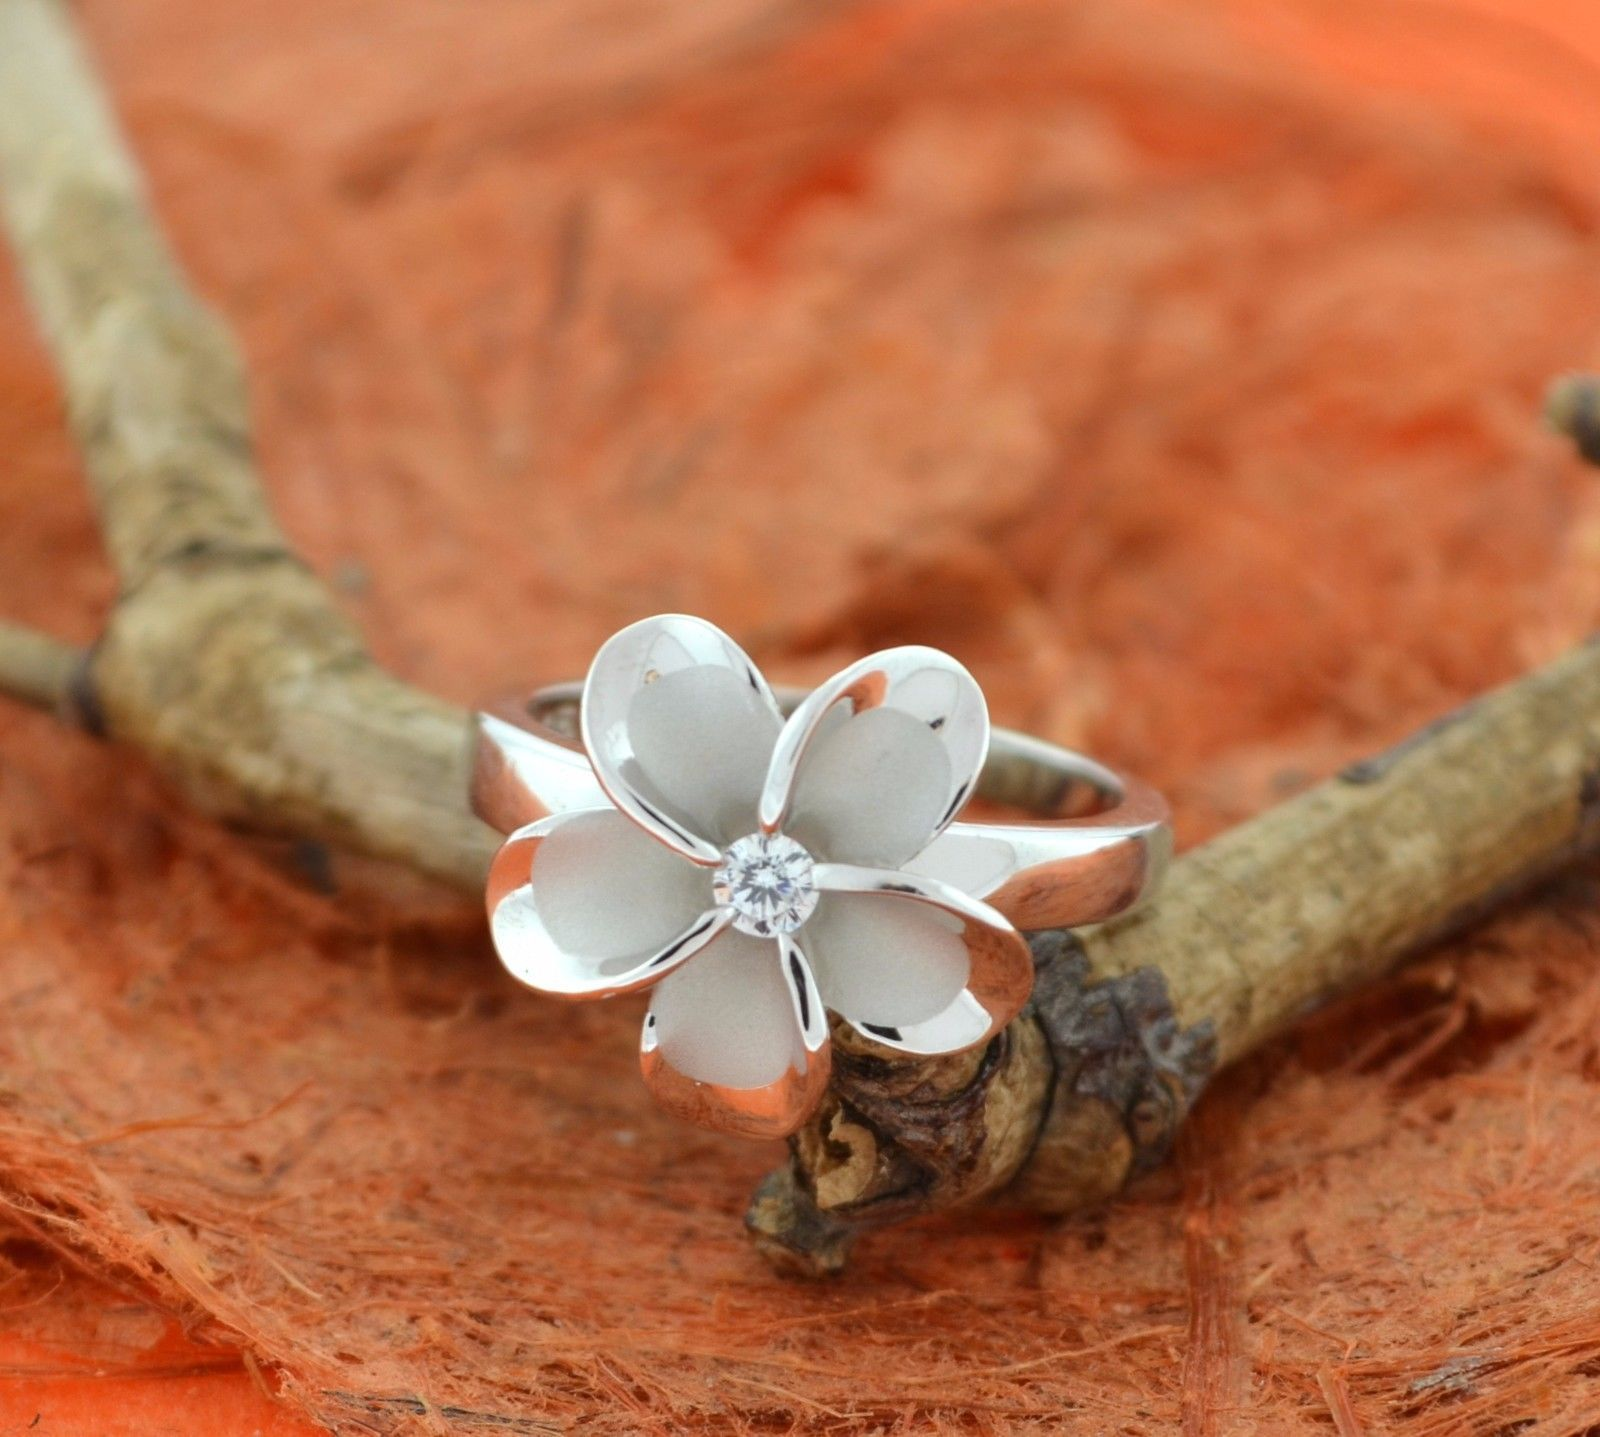 Plumeria cz flower ring sterling silver hawaiianflowercutefancy plumeria cz flower ring sterling silver hawaiianflowercutefancy izmirmasajfo